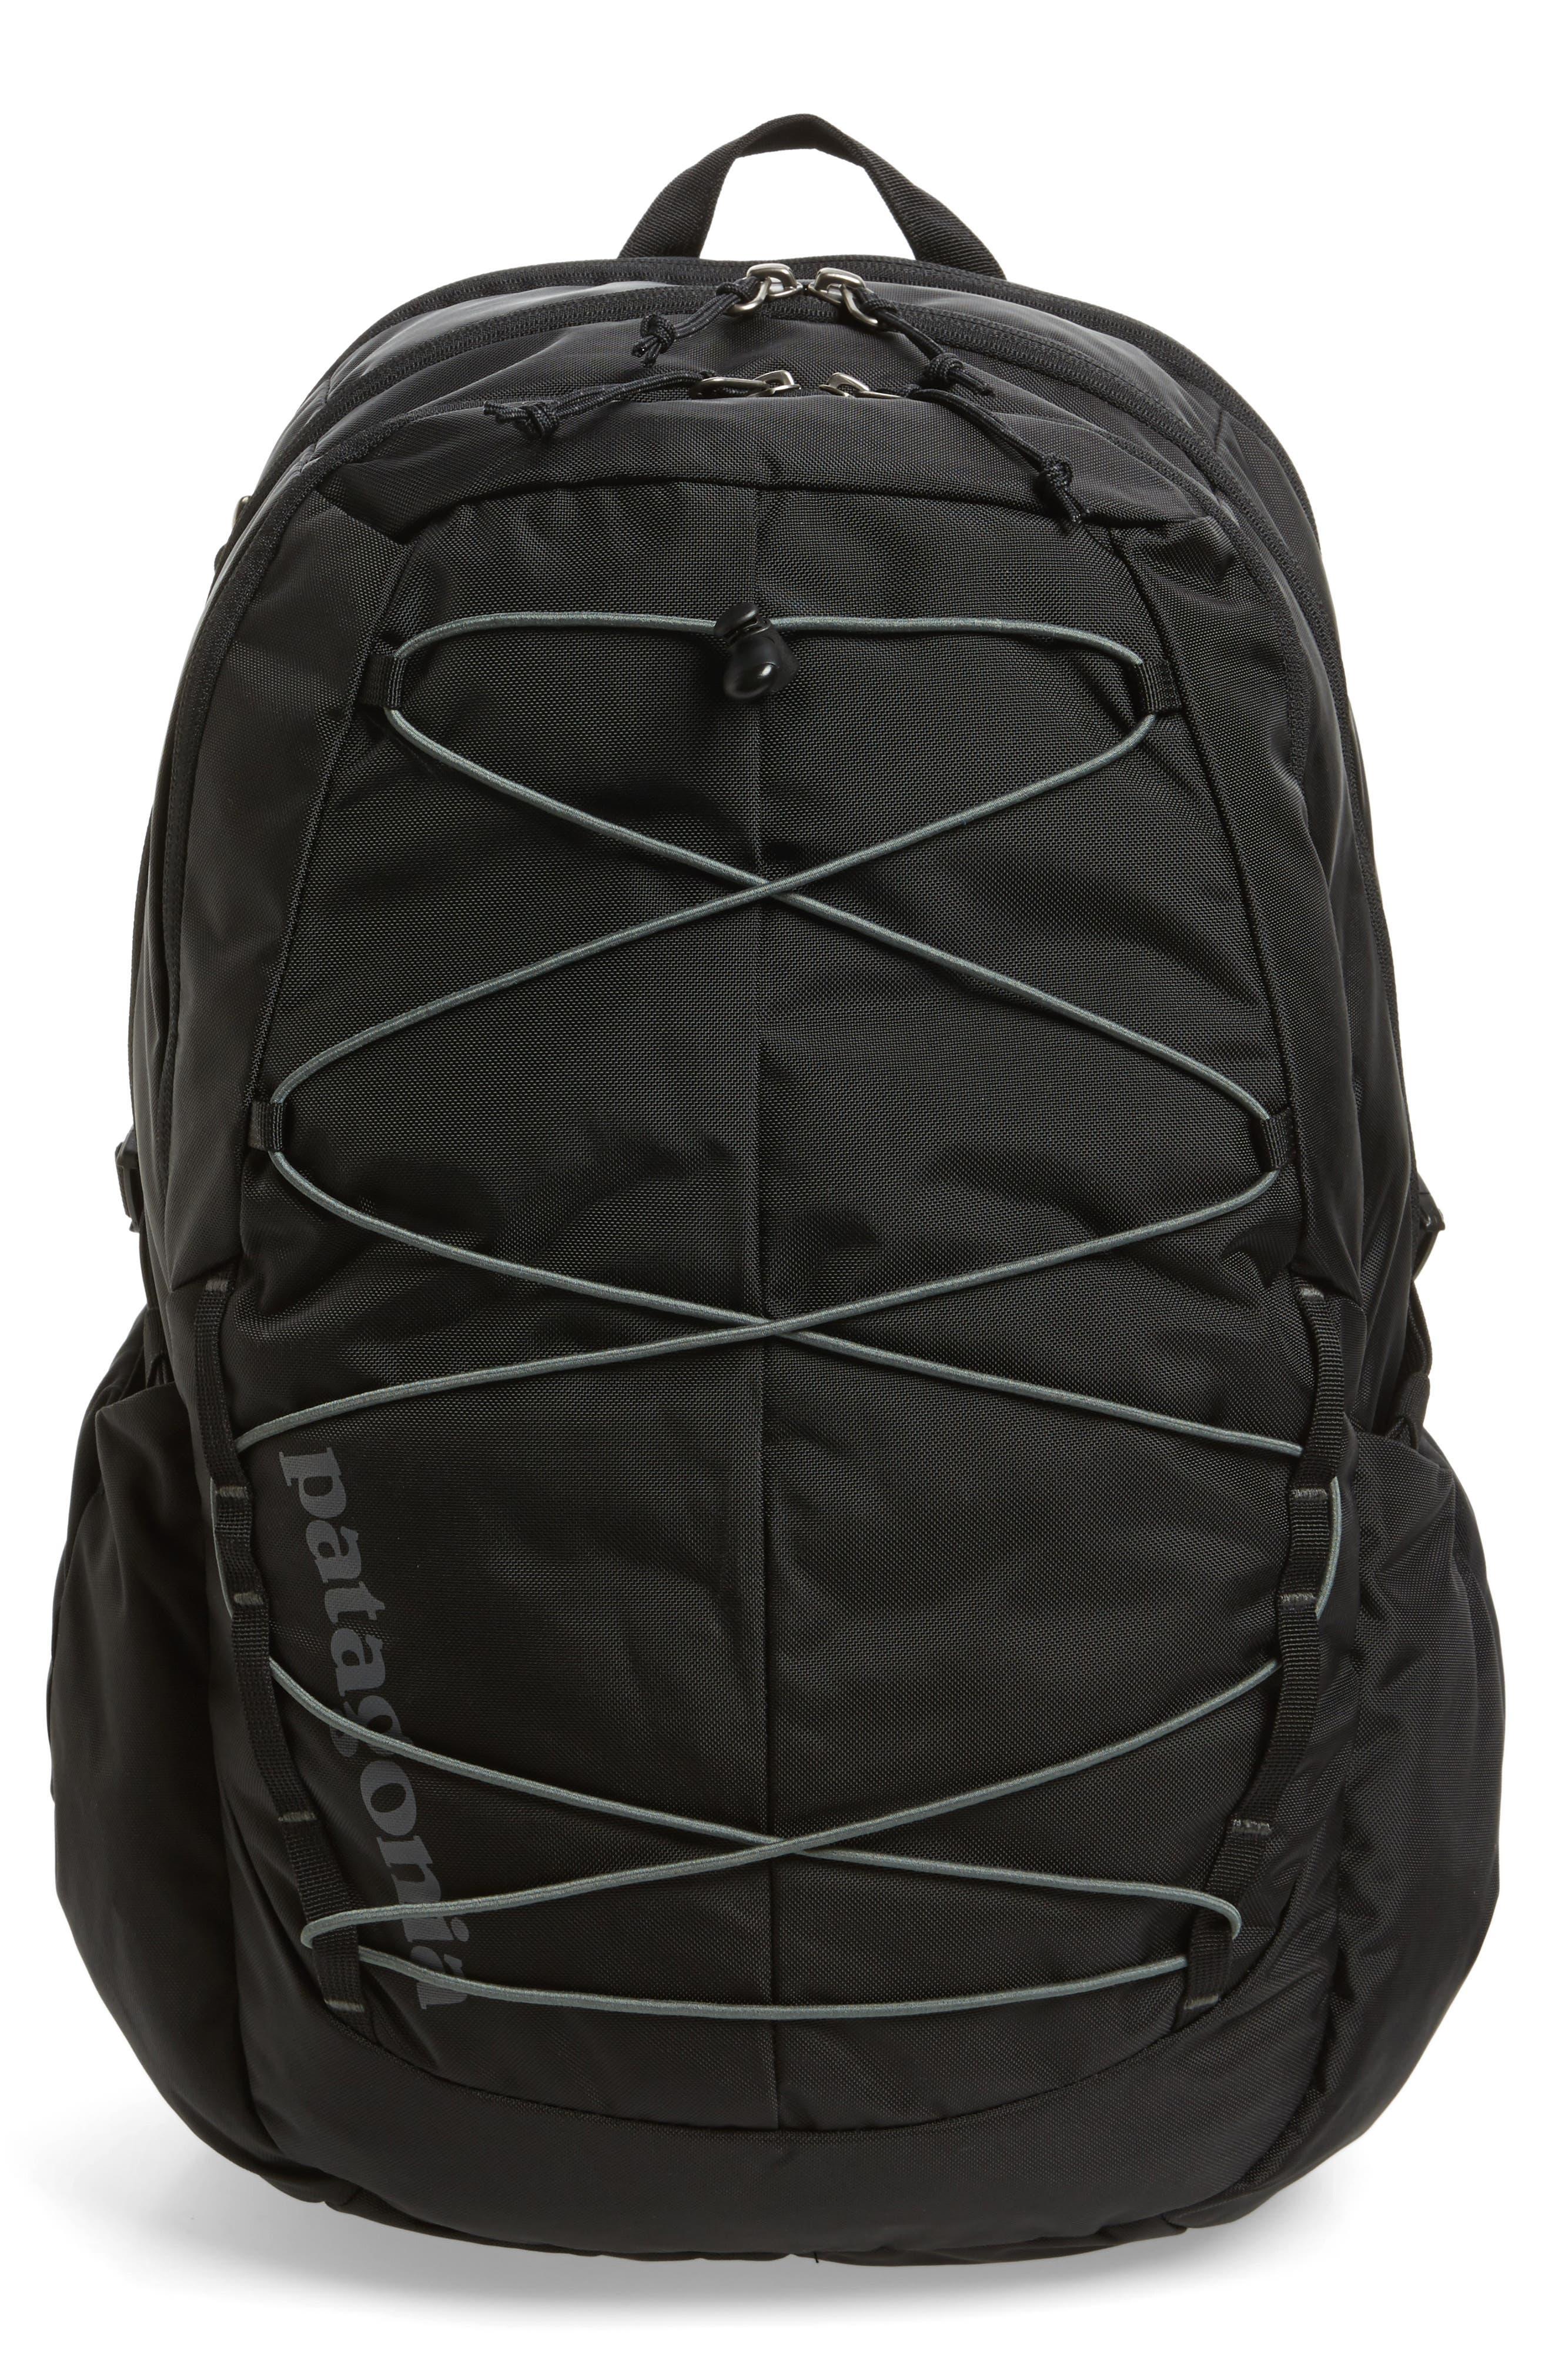 30L Chacabuco Backpack,                             Main thumbnail 1, color,                             BLACK